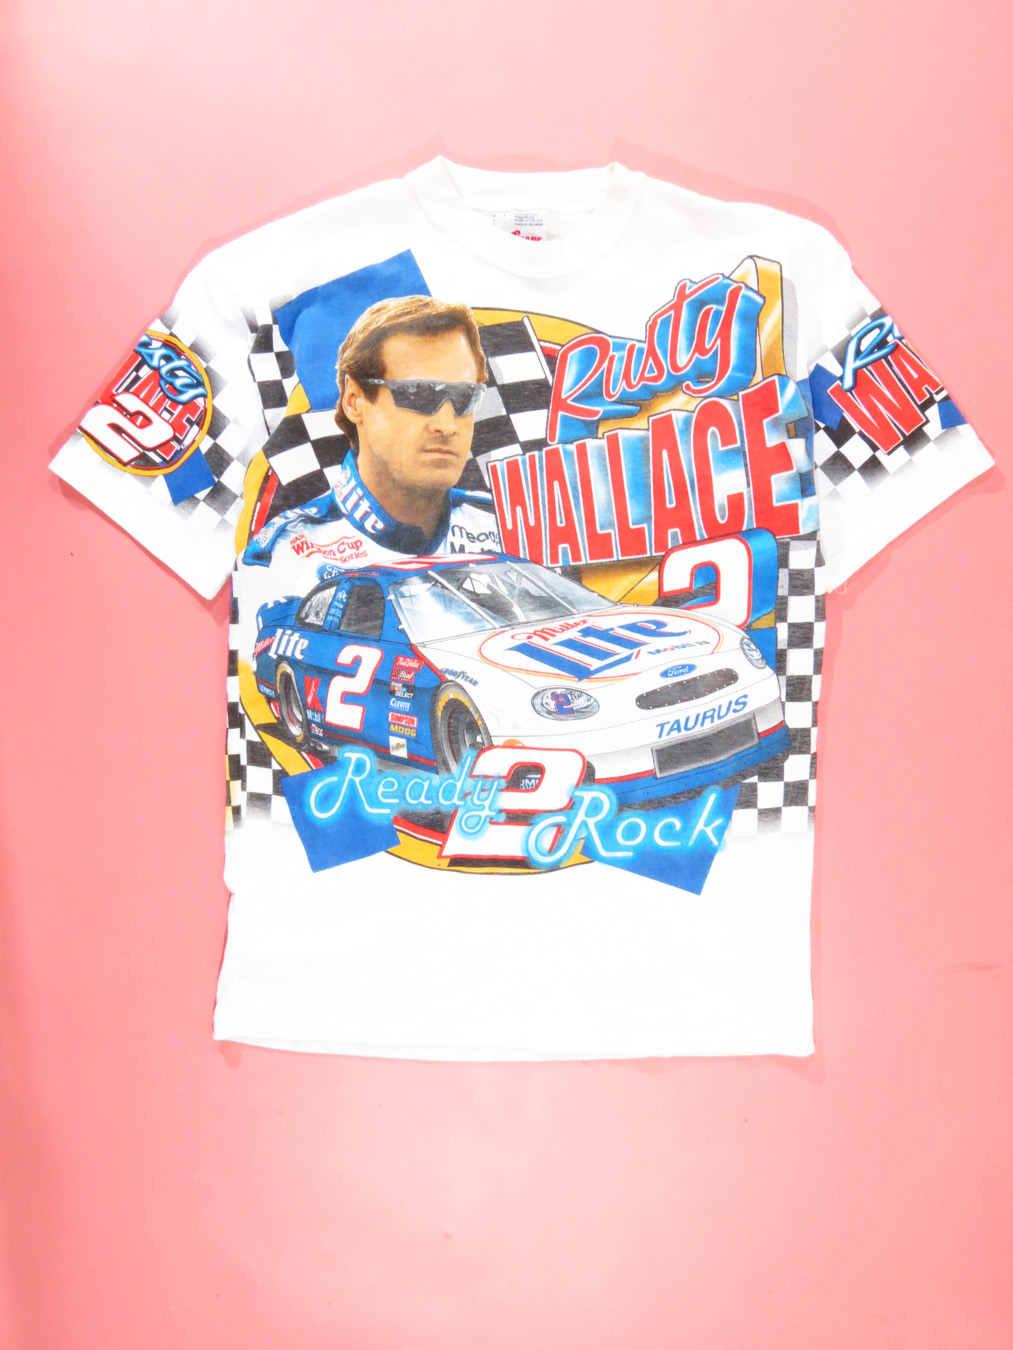 fe6a3698af5735 Rusty Wallace NASCAR Print  Ready Rock  T-Shirt - 5 Star Vintage